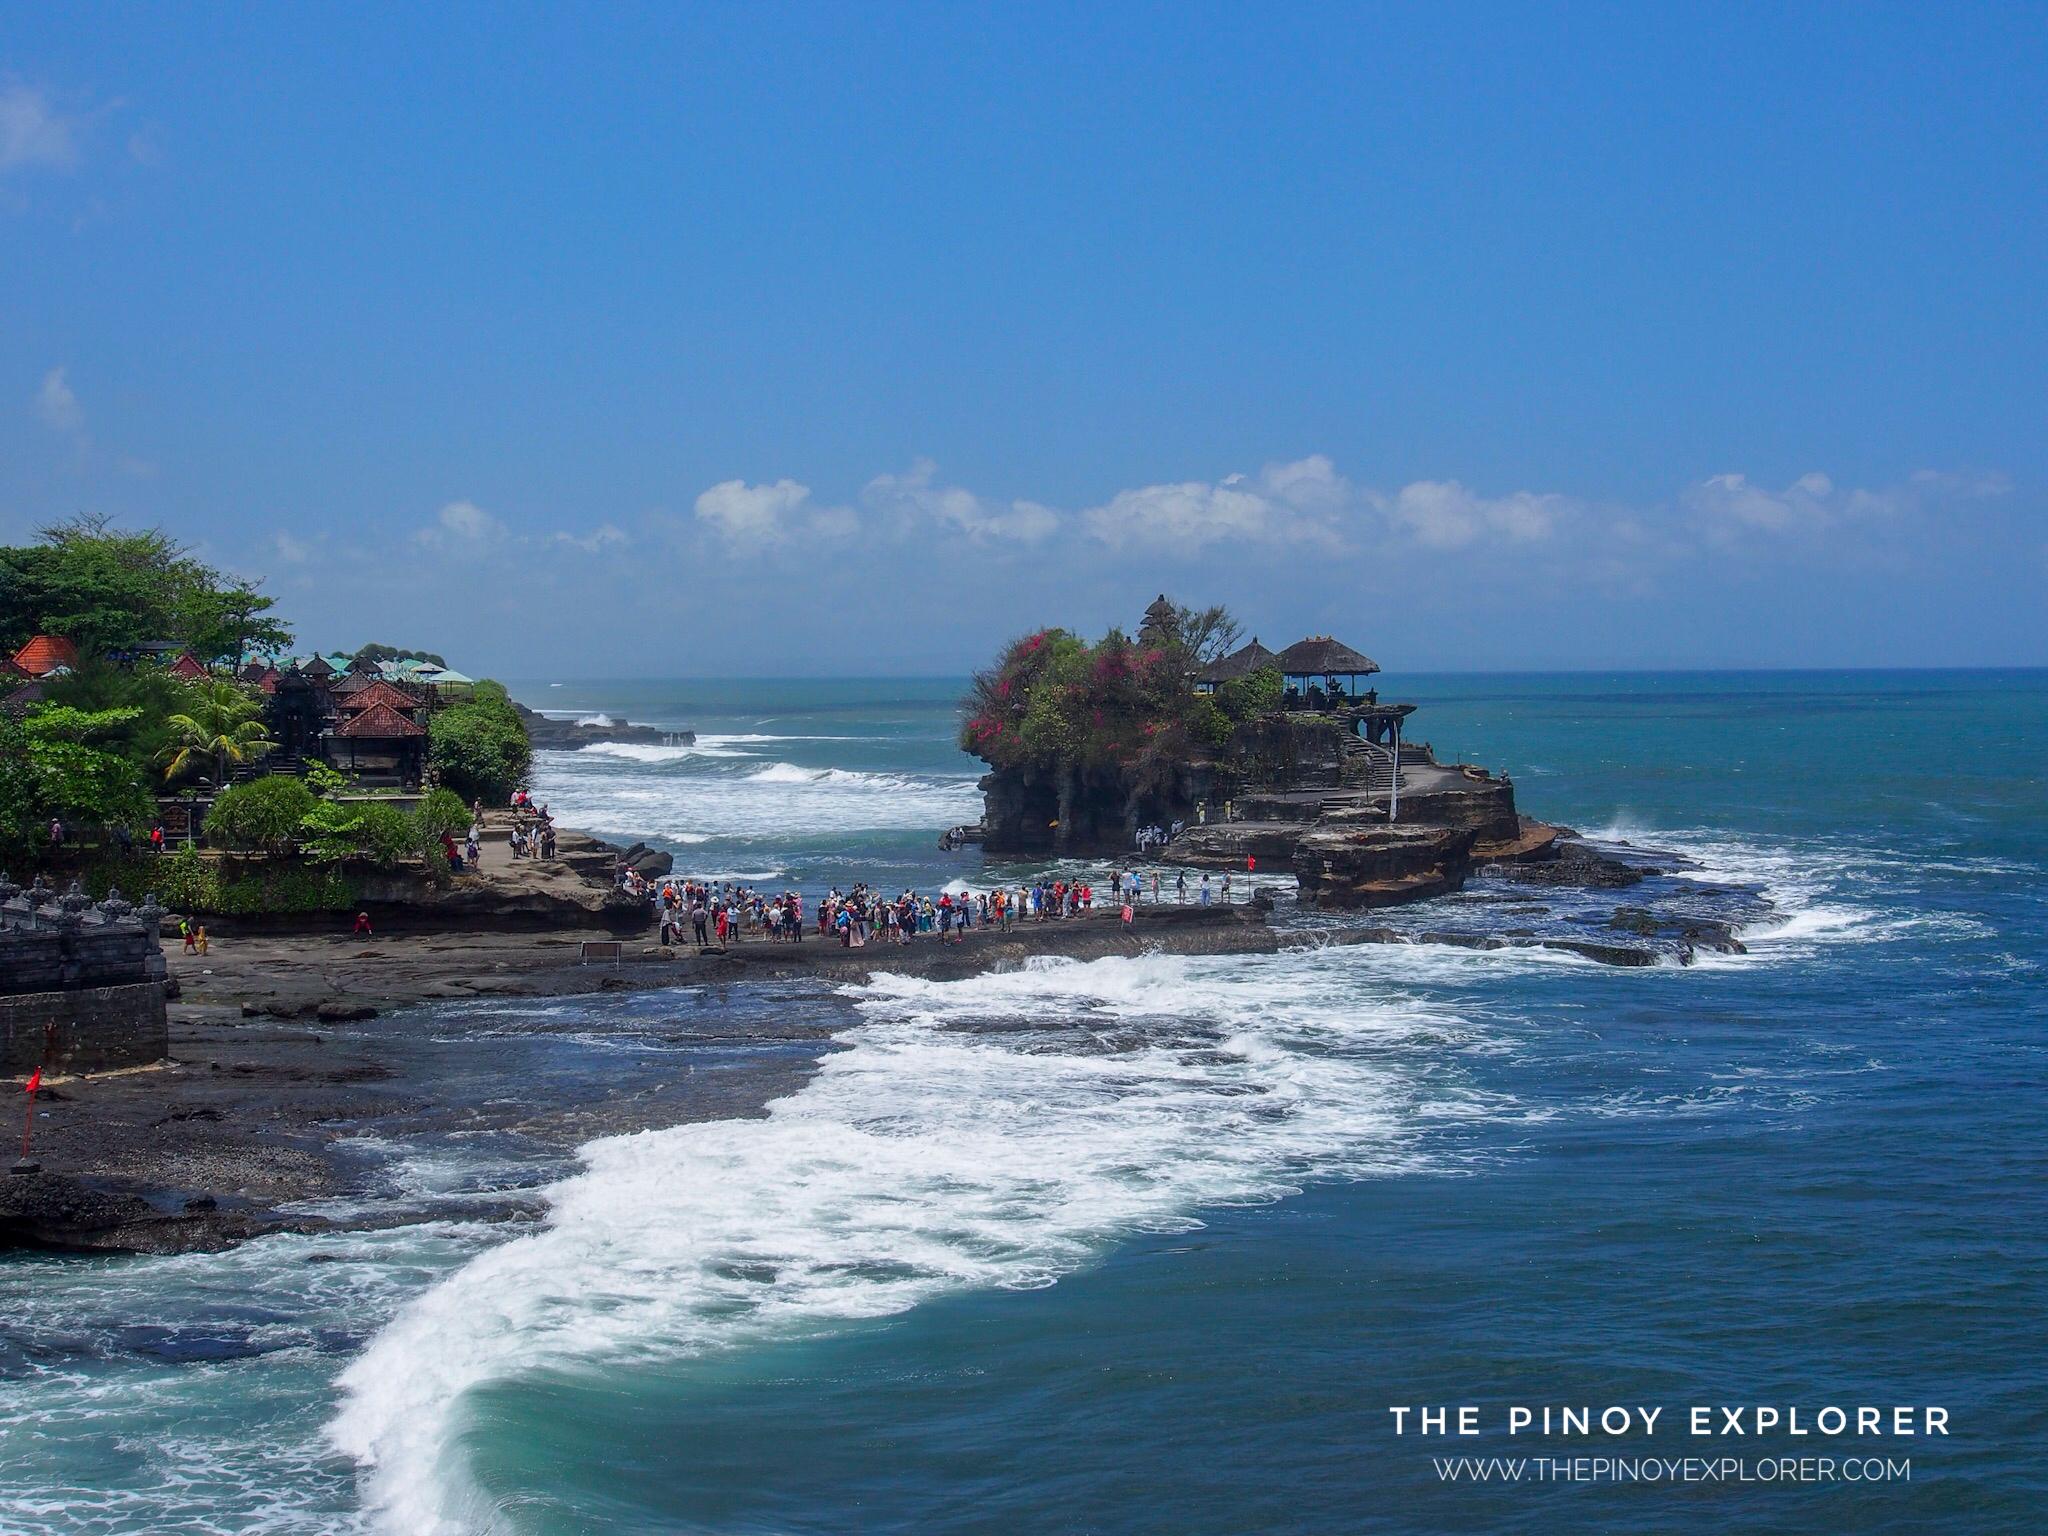 A glimpse of Bali